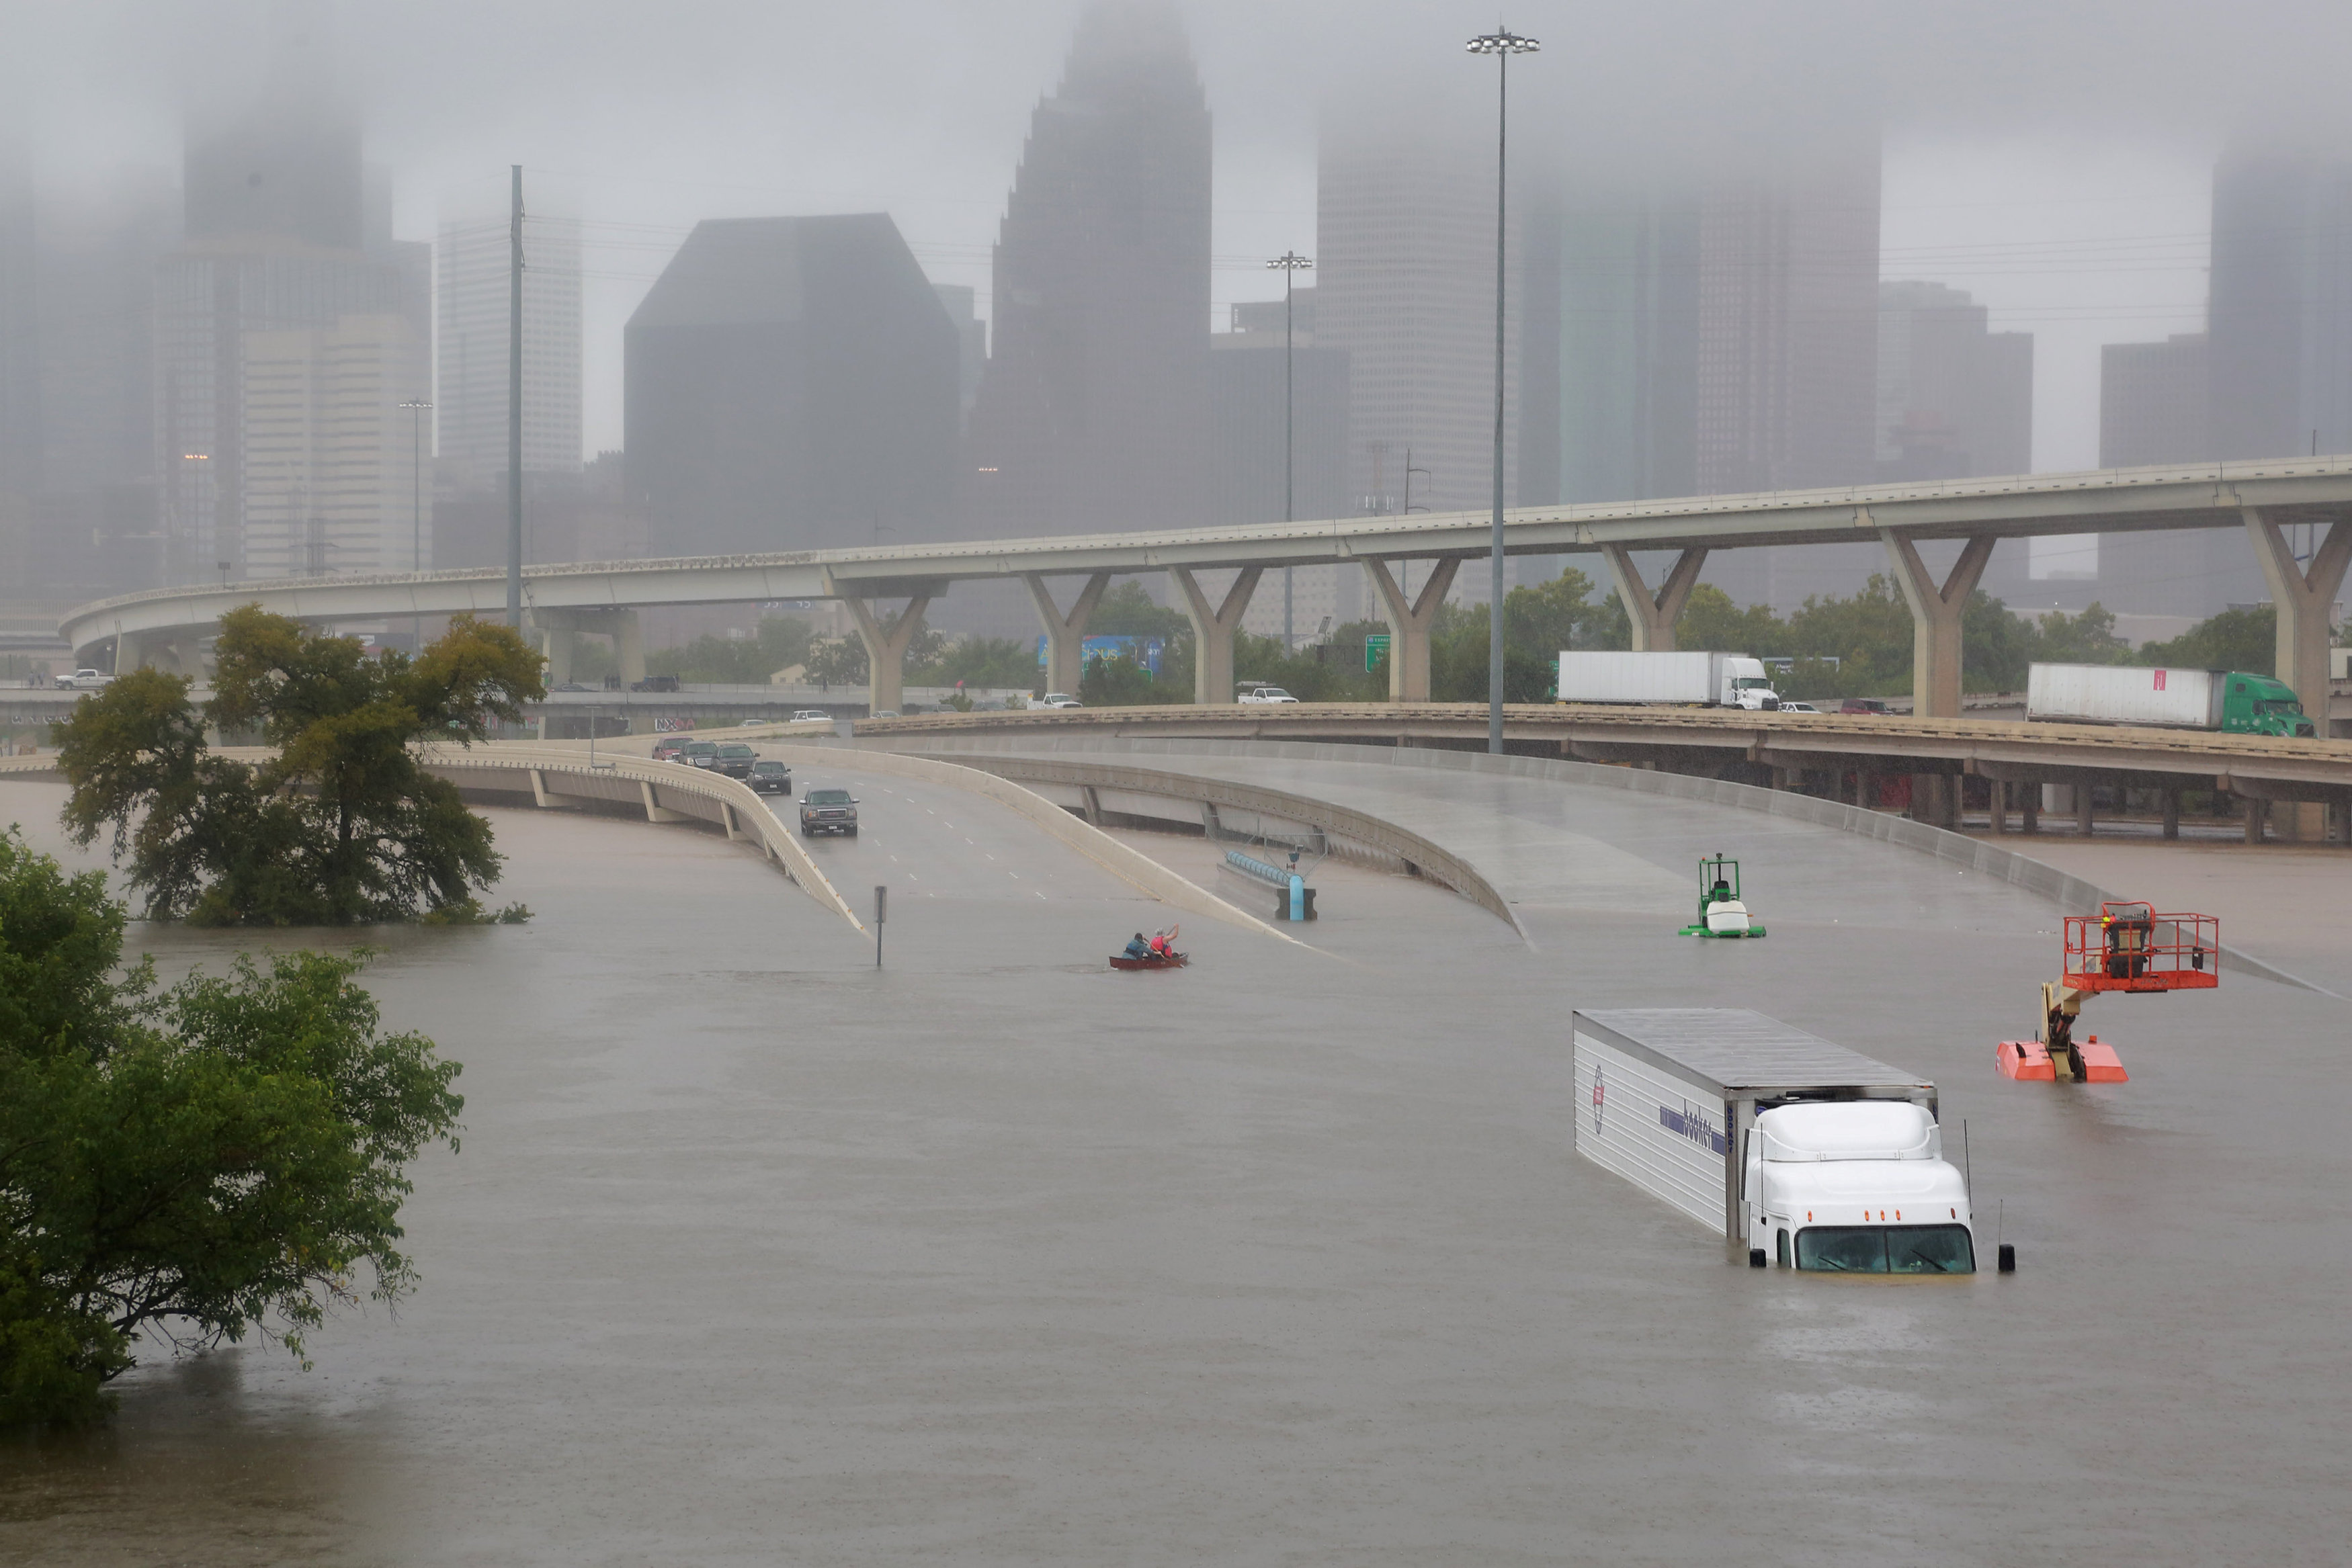 Tropical Storm Harvey cripples Houston with rains and floods